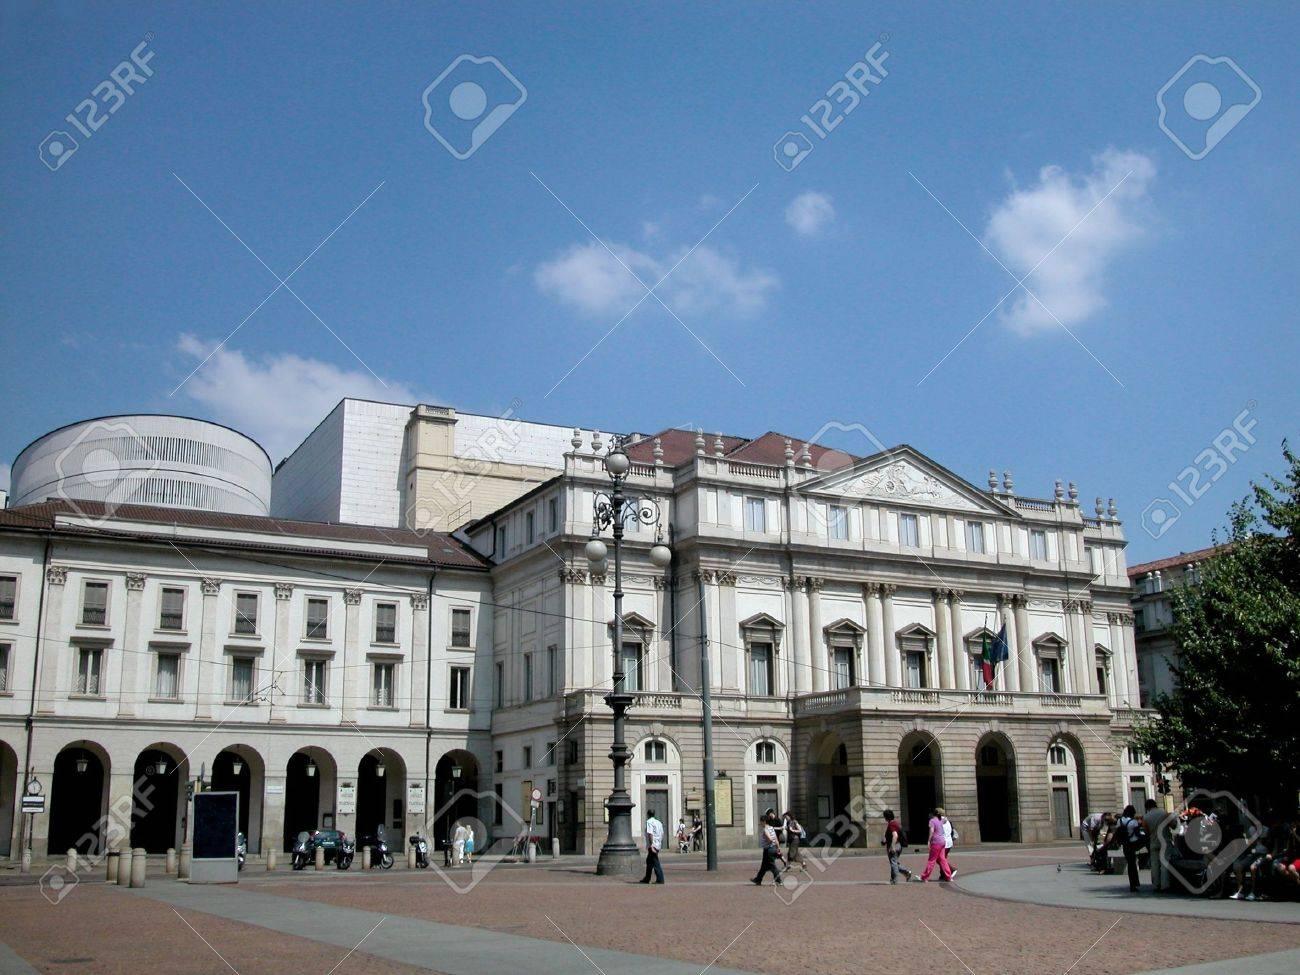 World's famous theater Scala in Milan, Italy Stock Photo - 6514687